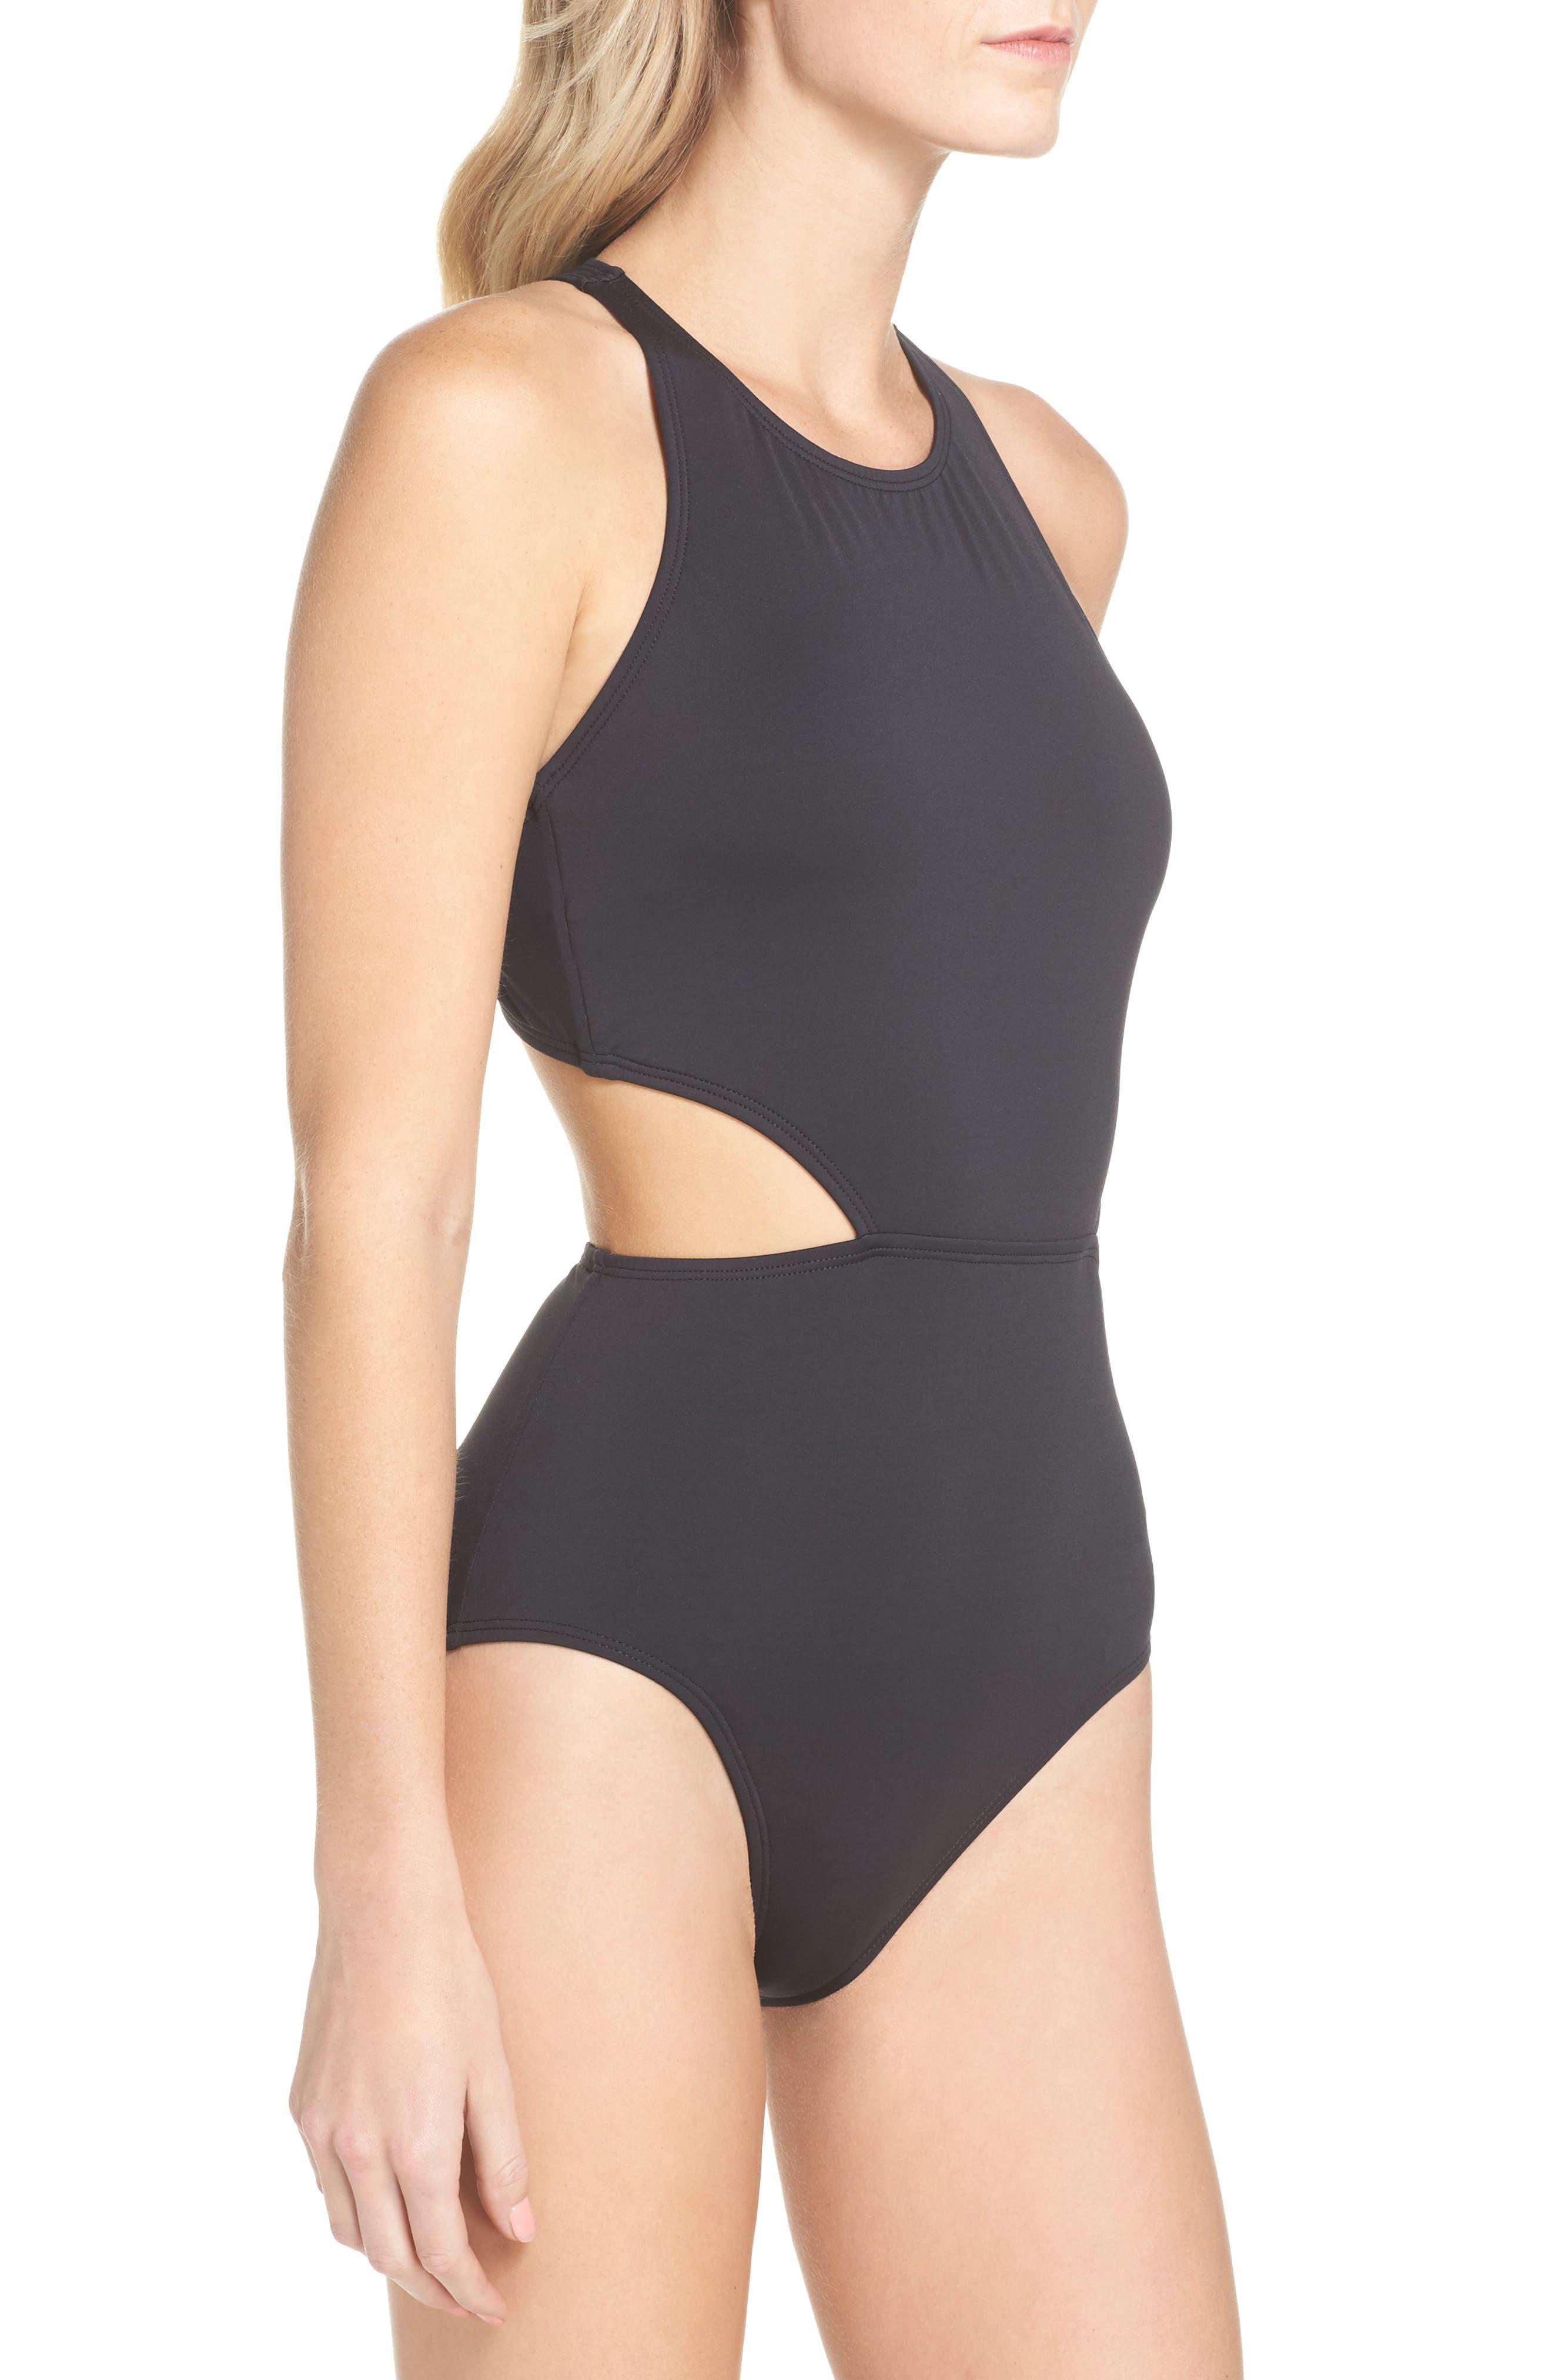 Pearl Cutout One-Piece Swimsuit,                             Alternate thumbnail 3, color,                             Black